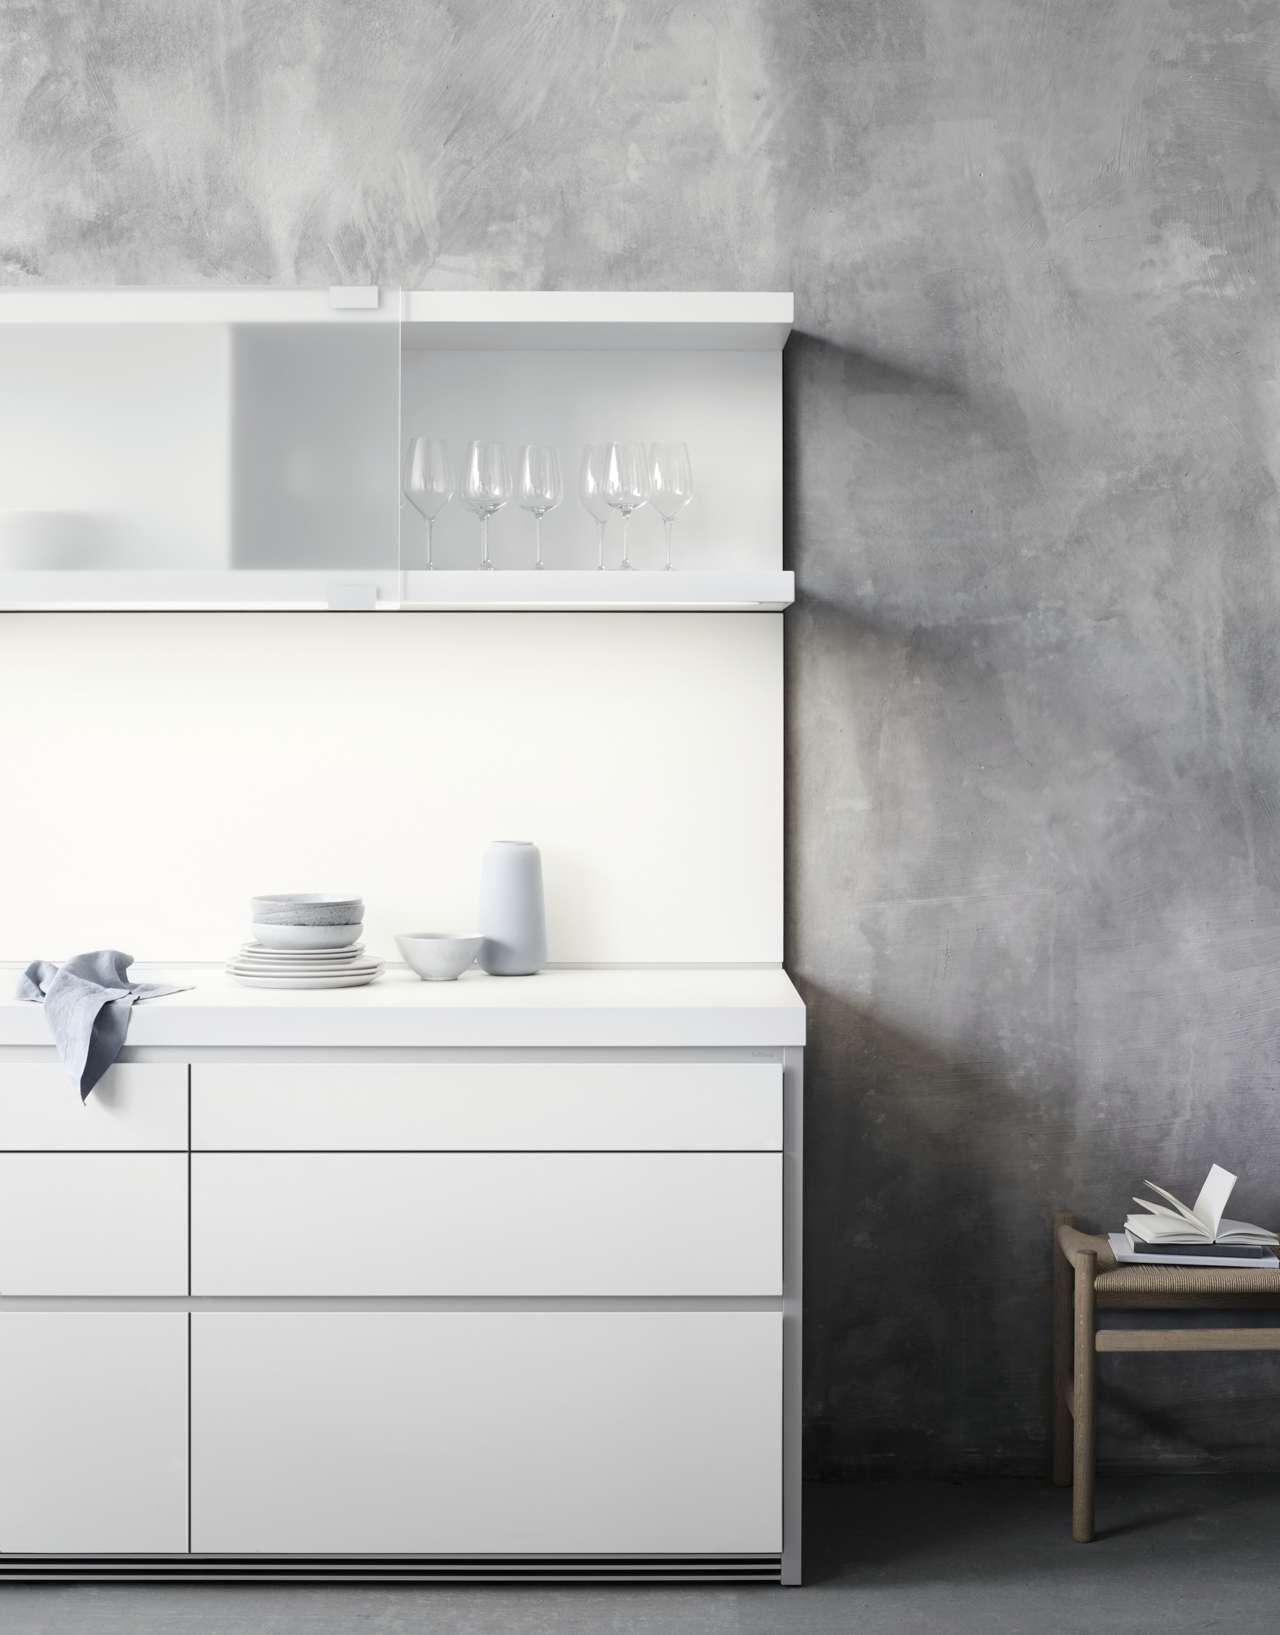 151003 bulthaup 06 001 srgb k chen journal. Black Bedroom Furniture Sets. Home Design Ideas